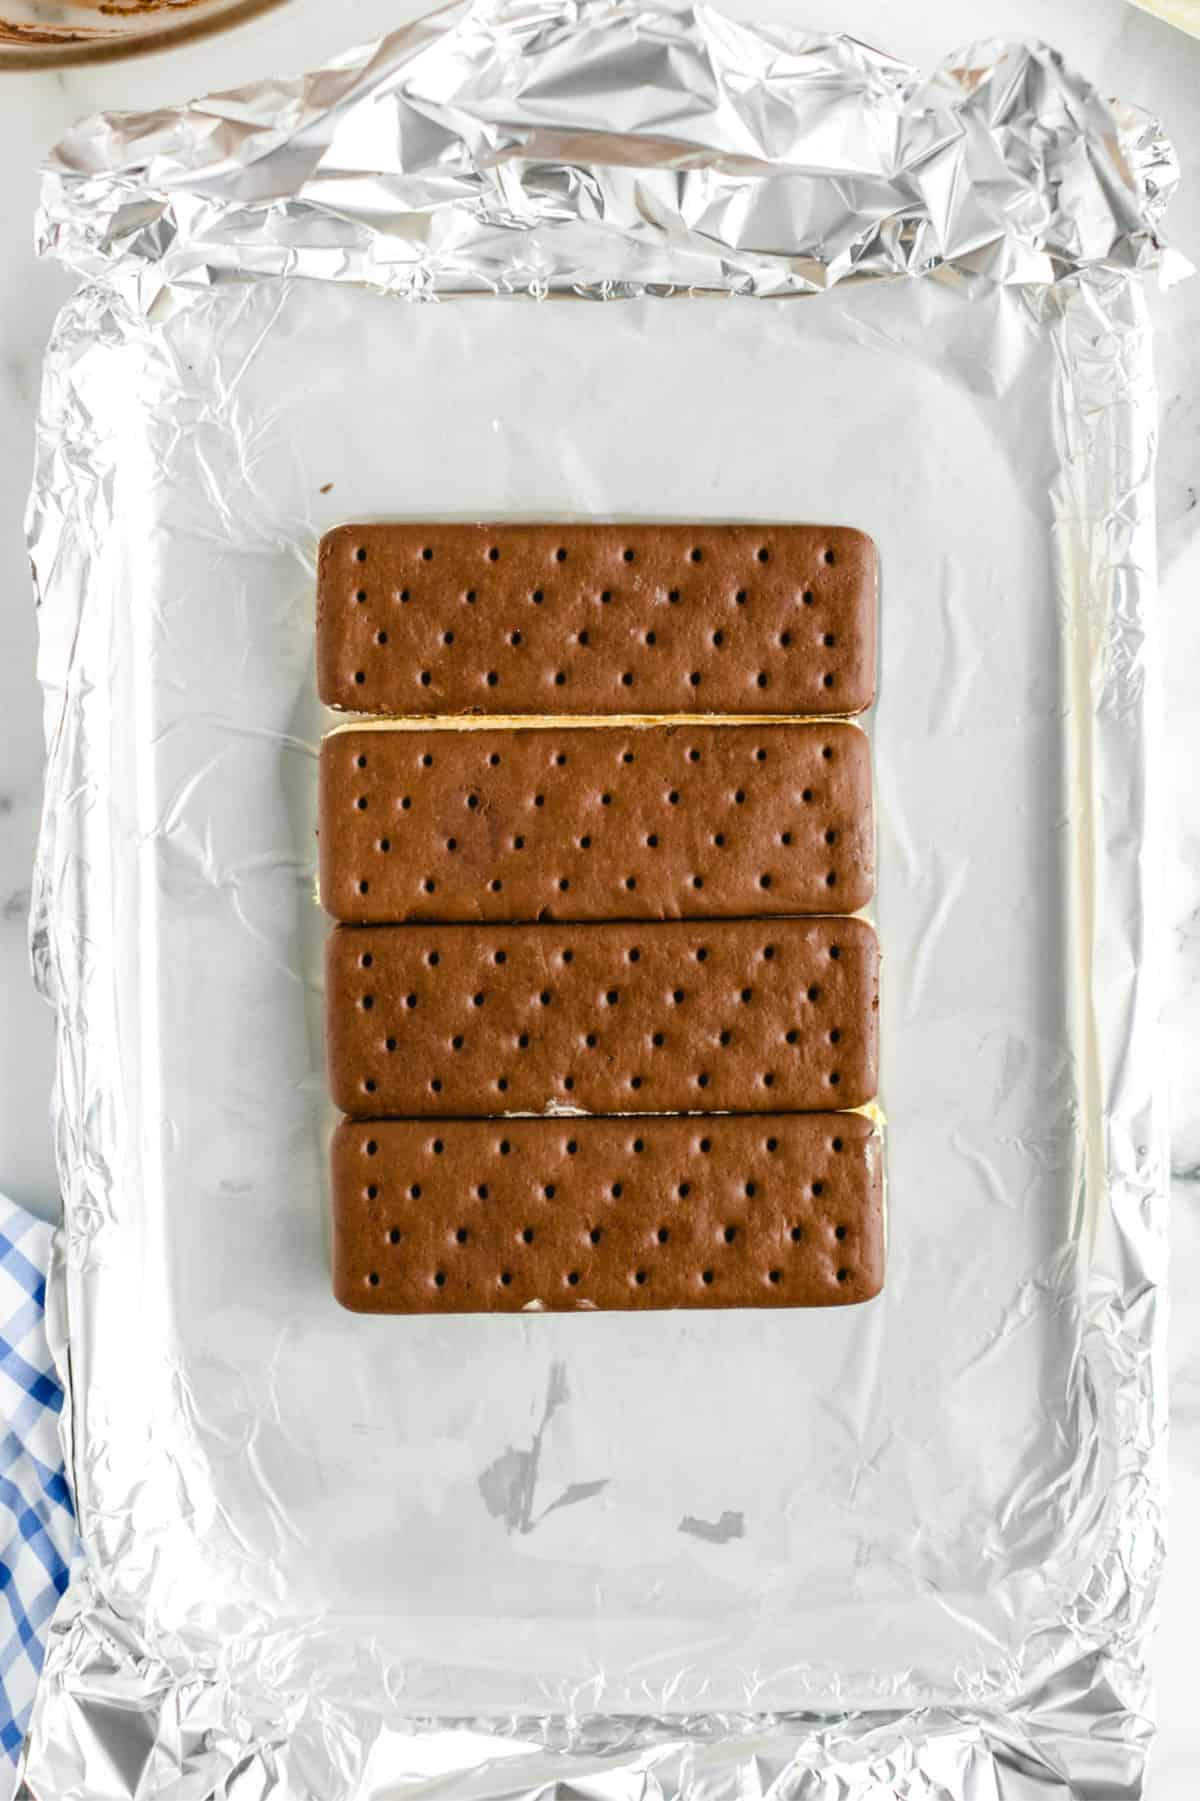 Ice Cream Cake in process 1